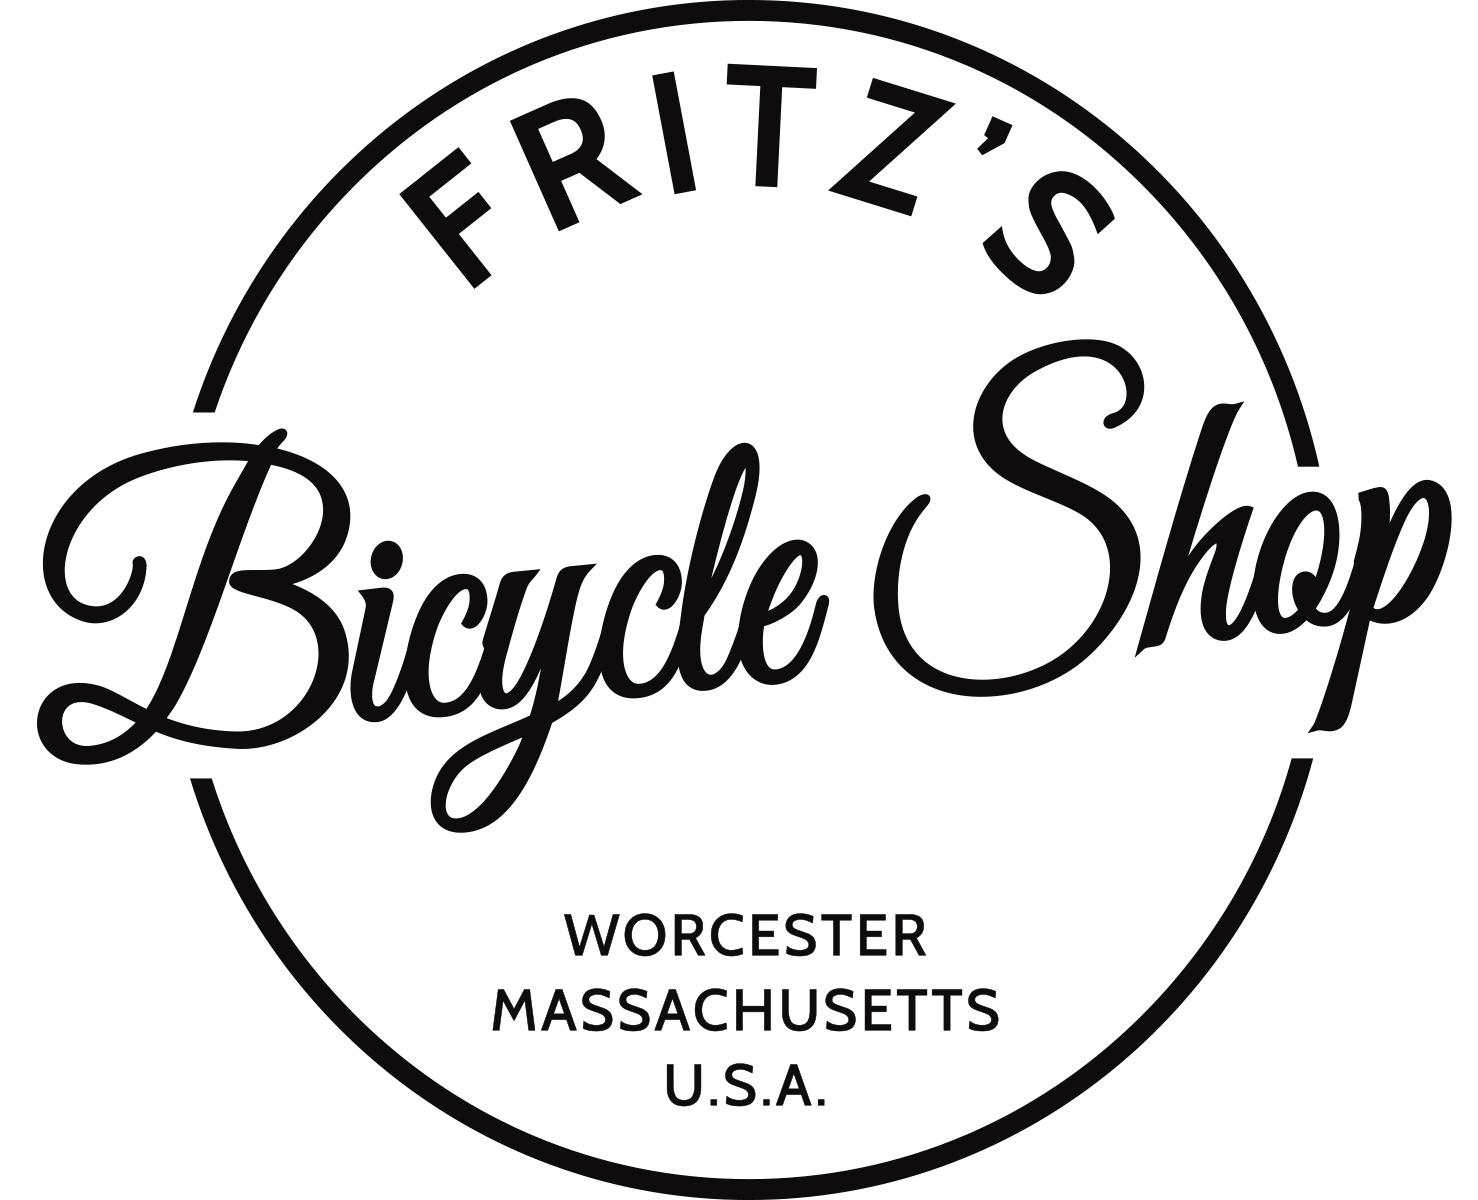 Sponsor Fritz's Bicycle Shop